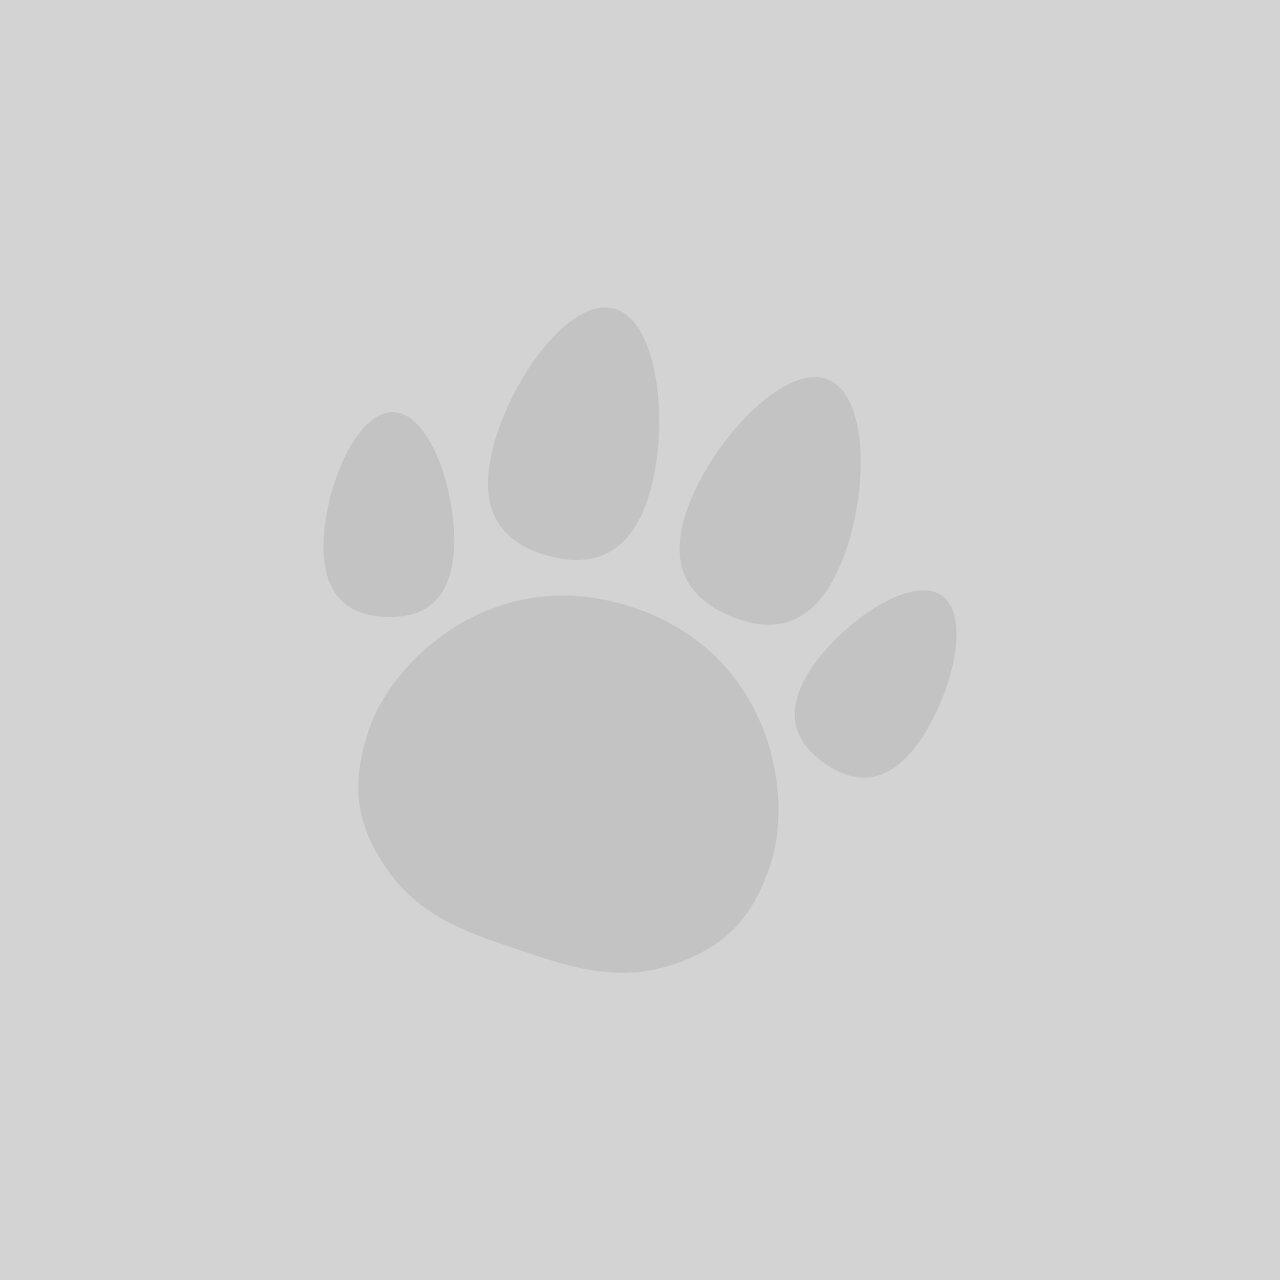 Drontal Dog Tasty Bone Worming Tablets x 6